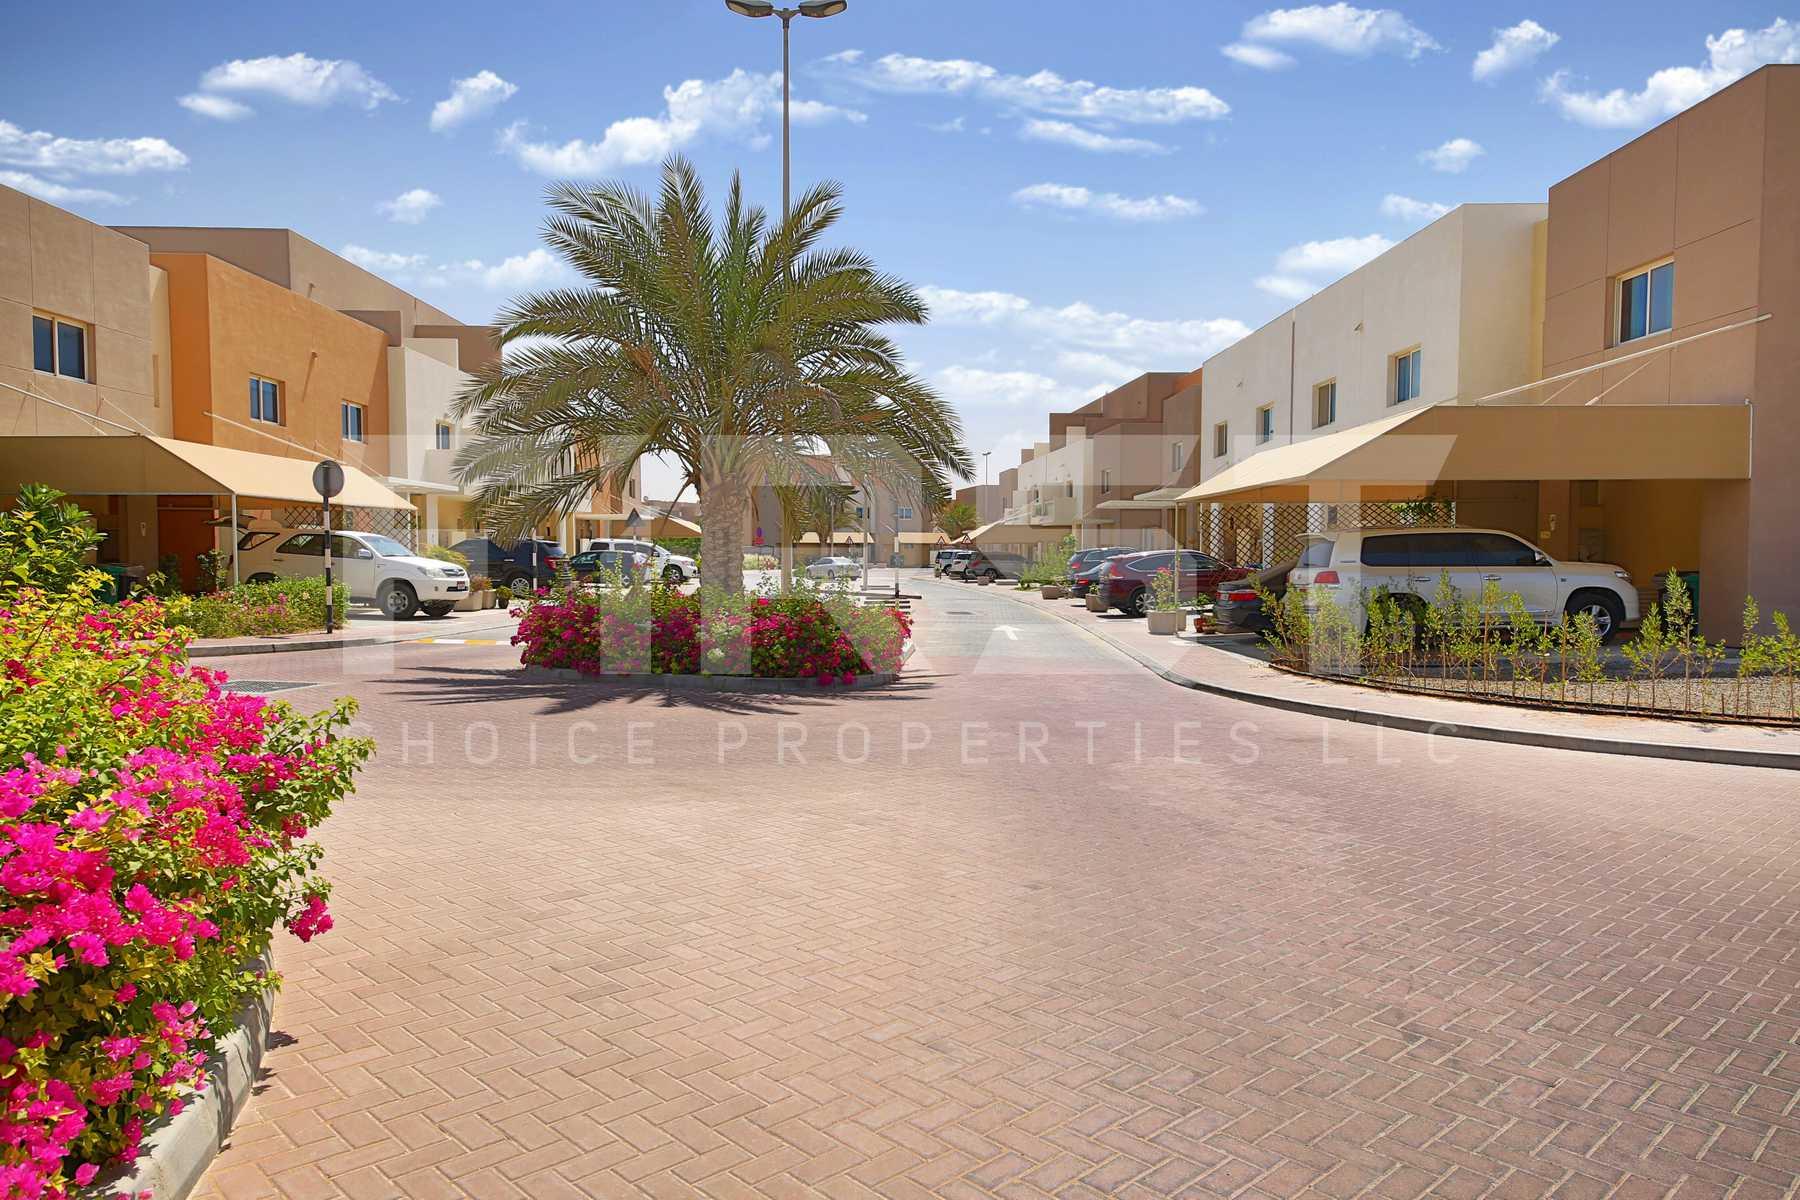 External Photo of Contemporary Village Al Reef Villas Al Reef Abu Dhabi UAE (11).jpg